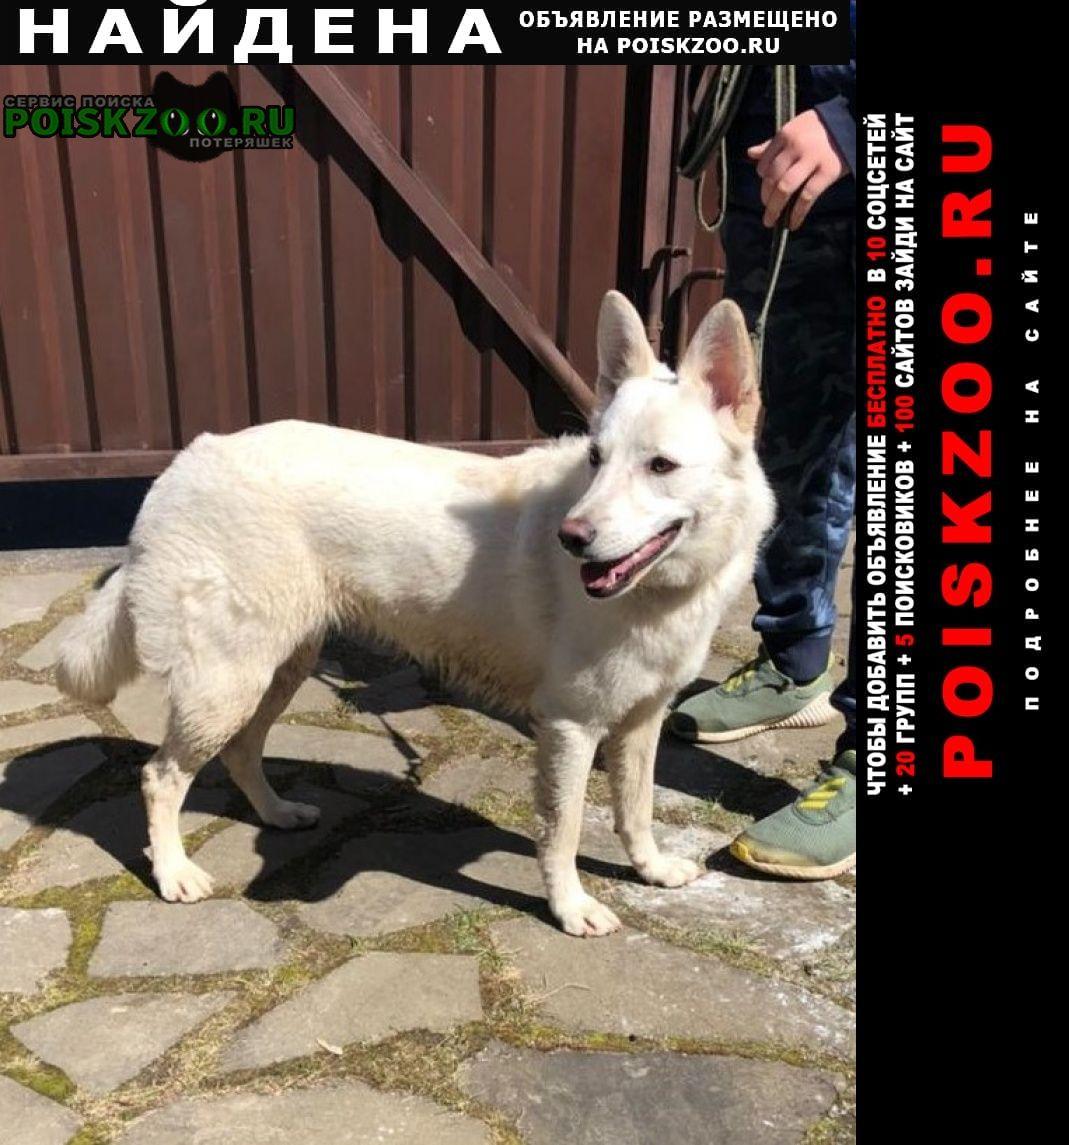 Найдена собака девочка. метис. возраст около 1 года Солнечногорск